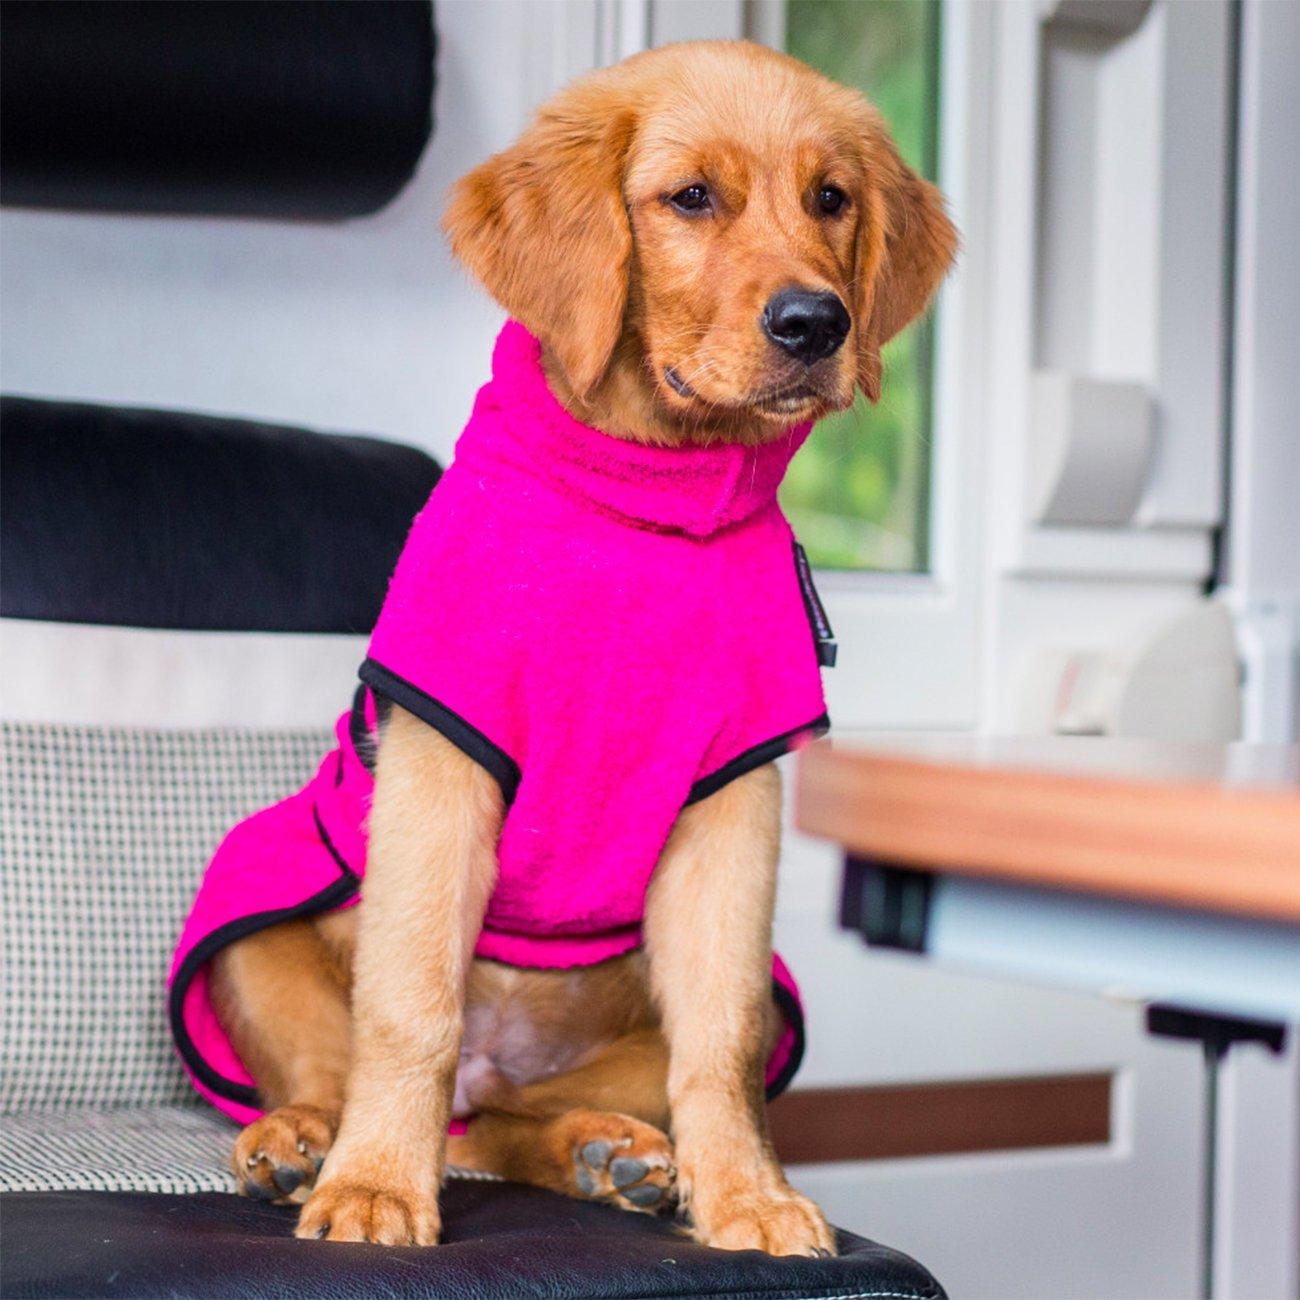 ActionFactory fit4dogs Dryup Mini Trockenmantel für Hunde, Bild 11